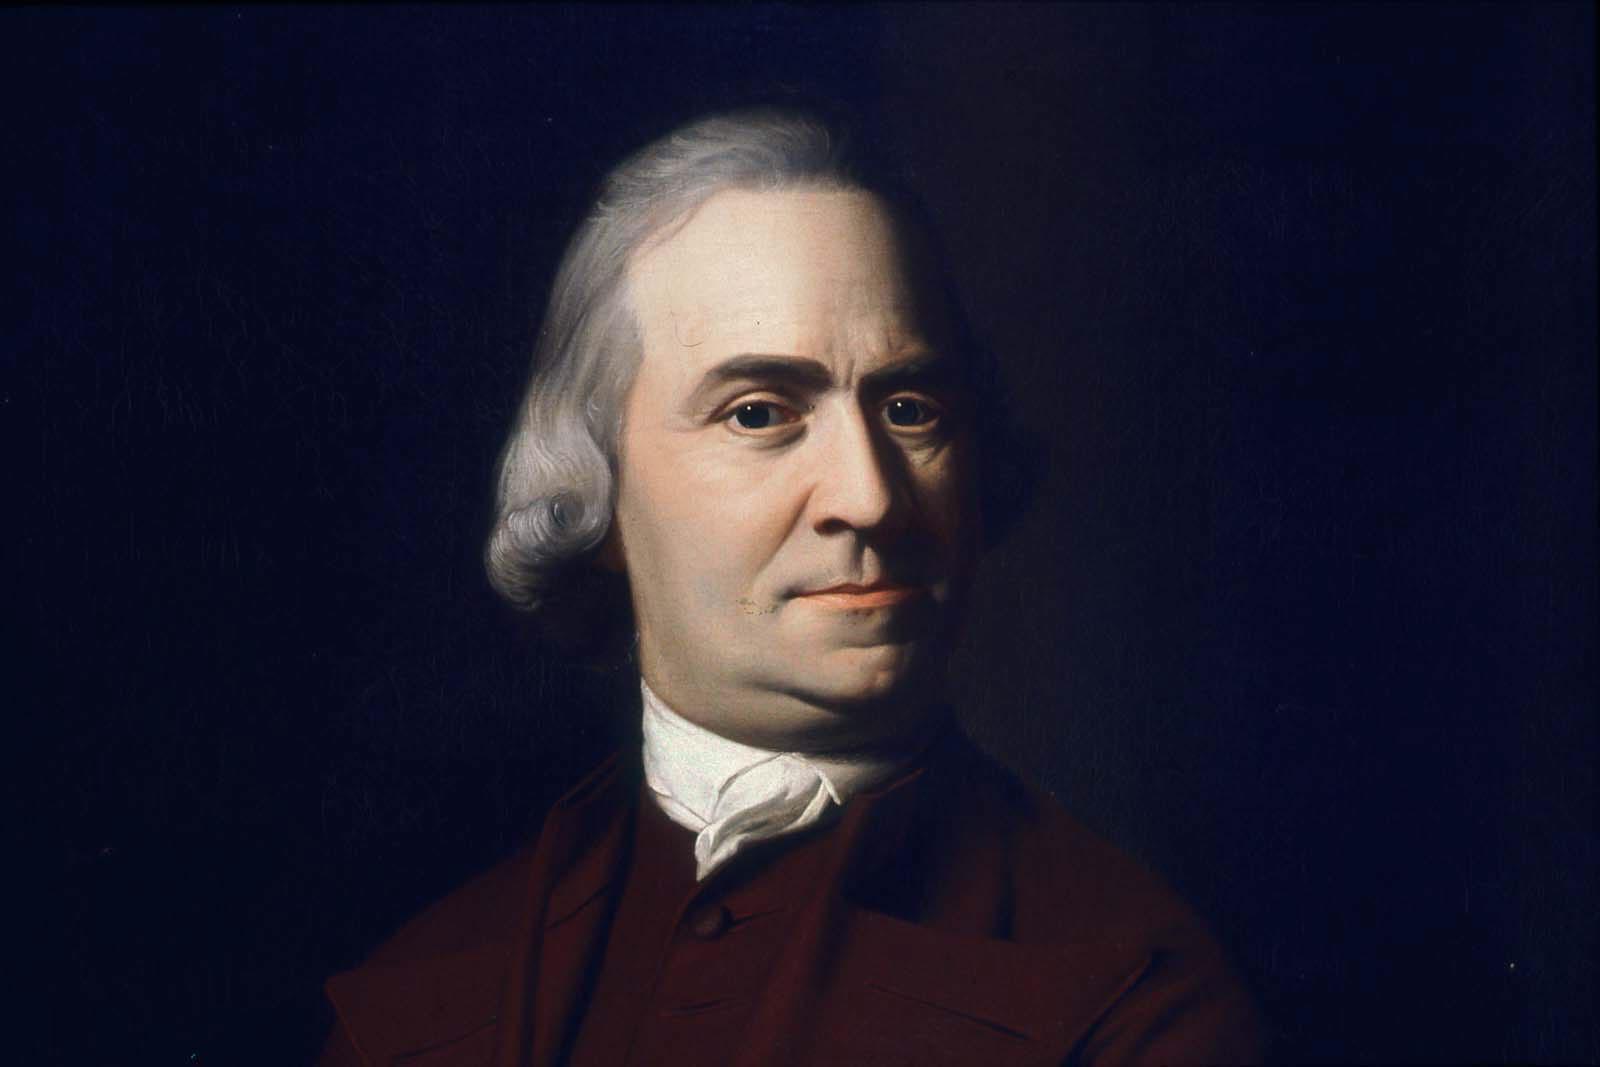 Samuel Adams Biography - Facts, Childhood, Family Life